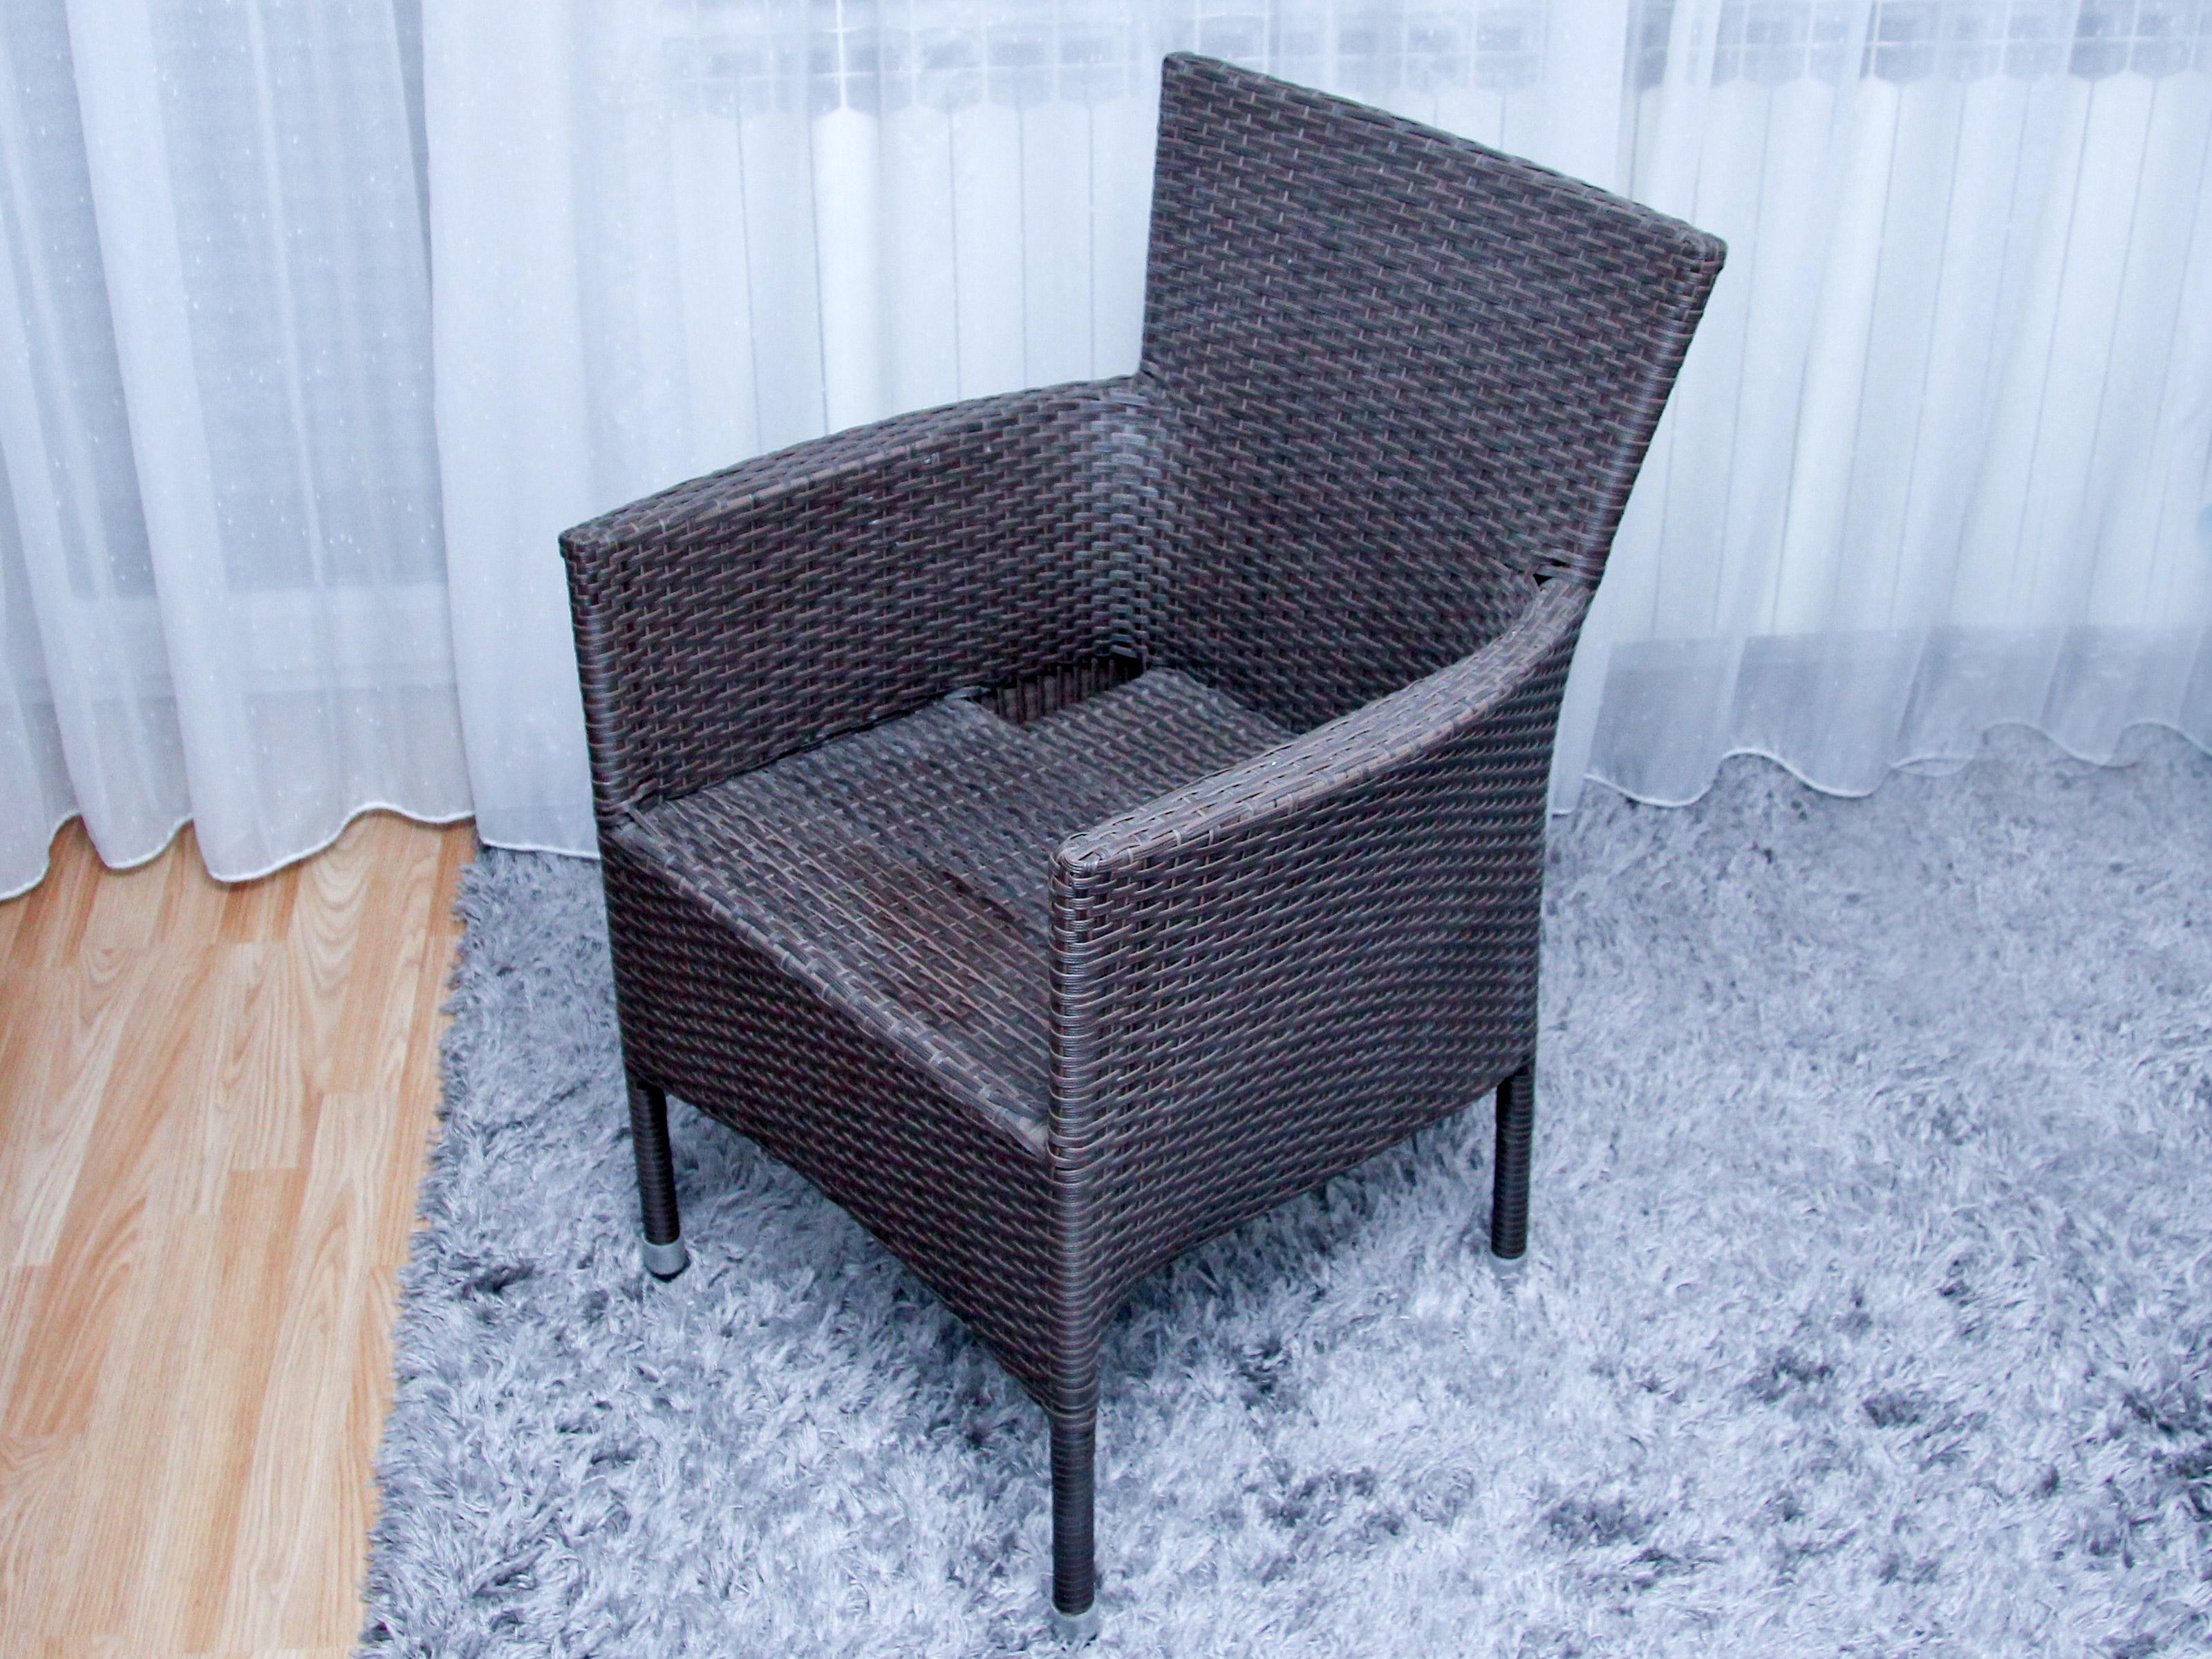 5 Ways To Clean Furniture